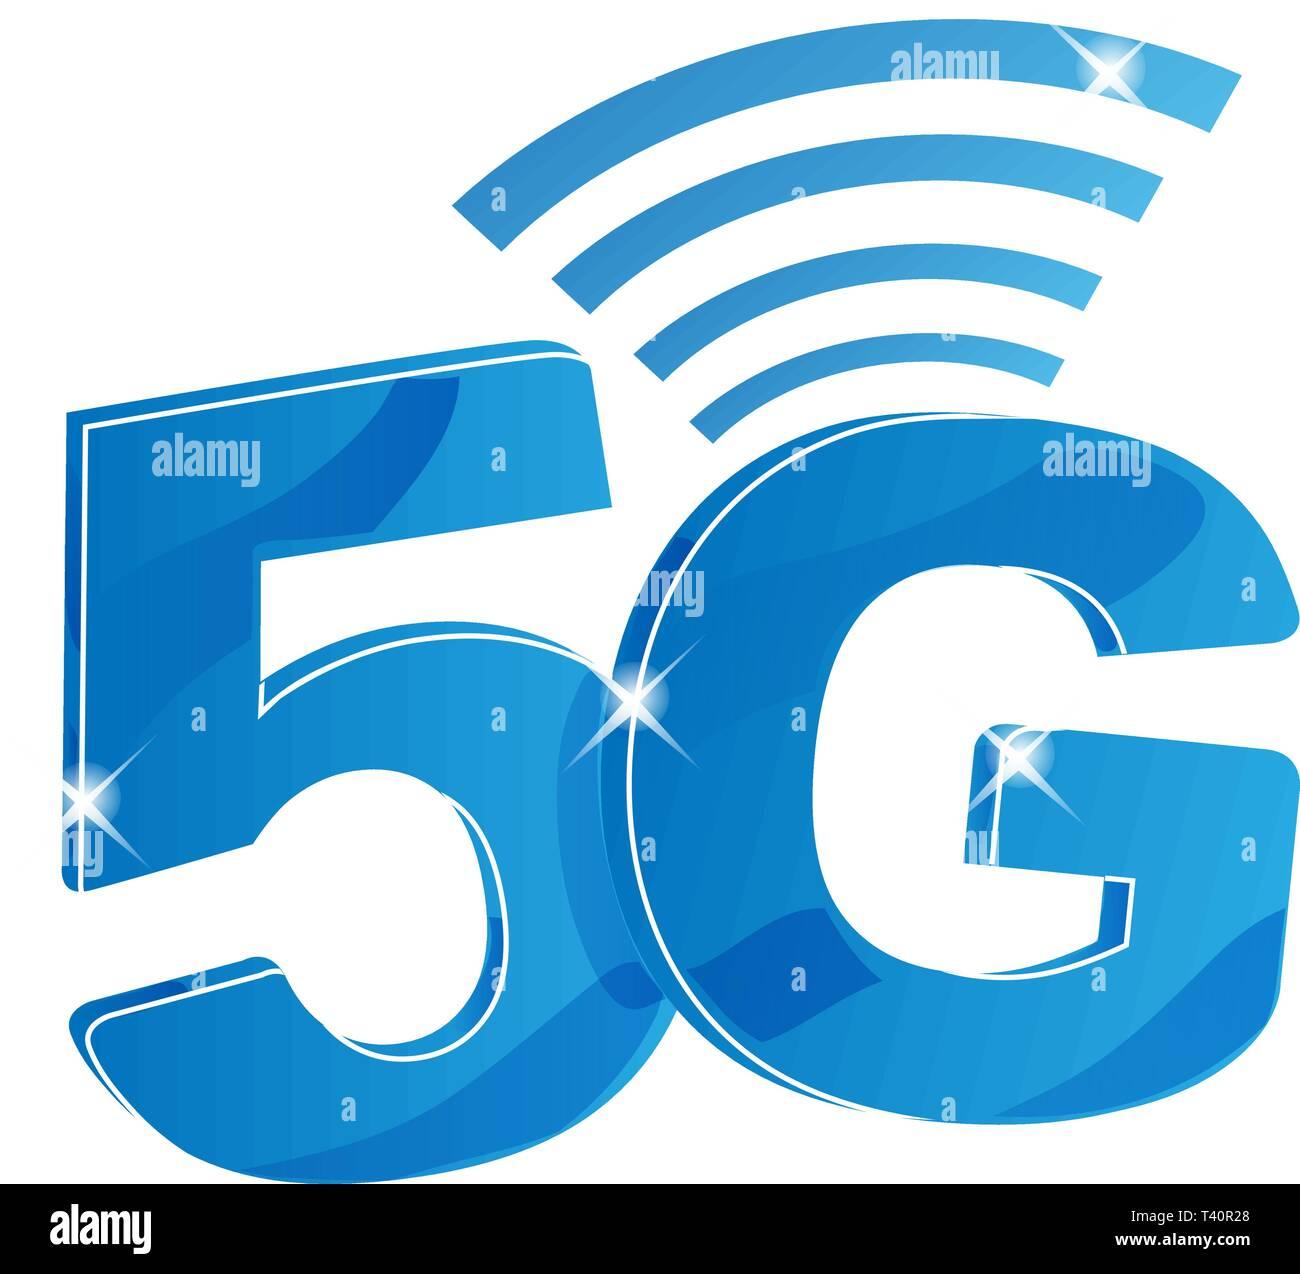 20G Internet Netzwerk vektor Logo. Isolierte Symbol für 20G Mobile ...